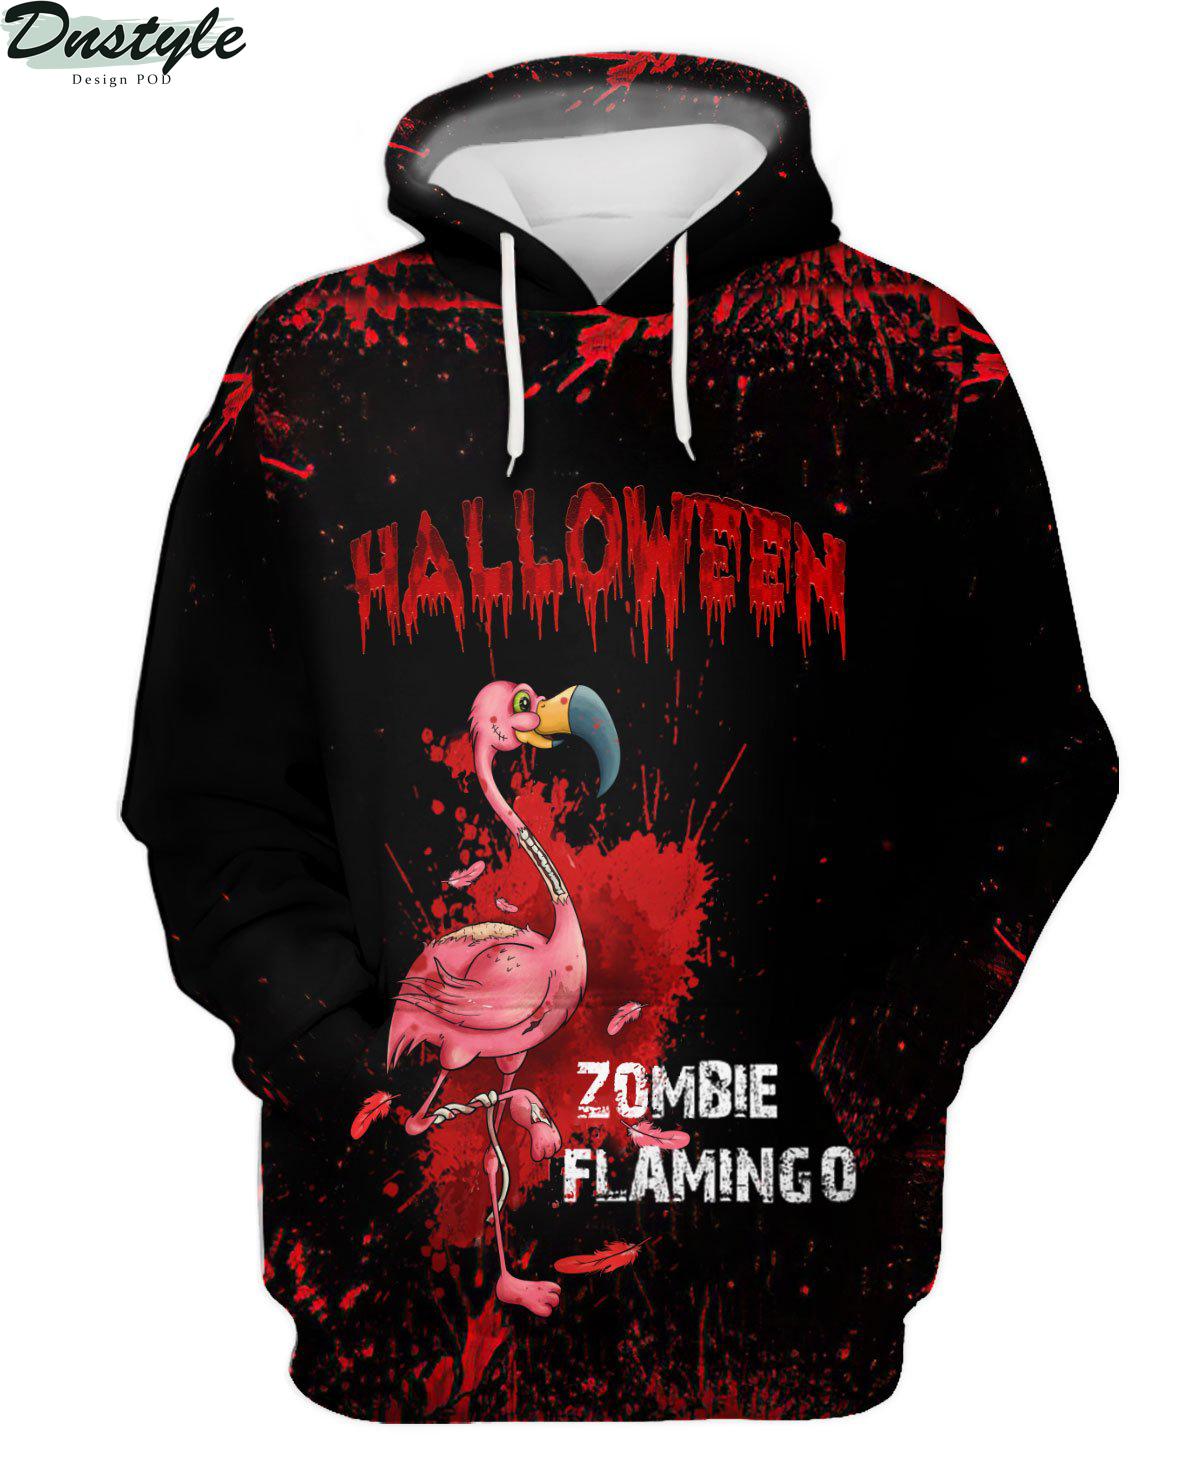 Flamingo Zombie Black Halloween 3d hoodie